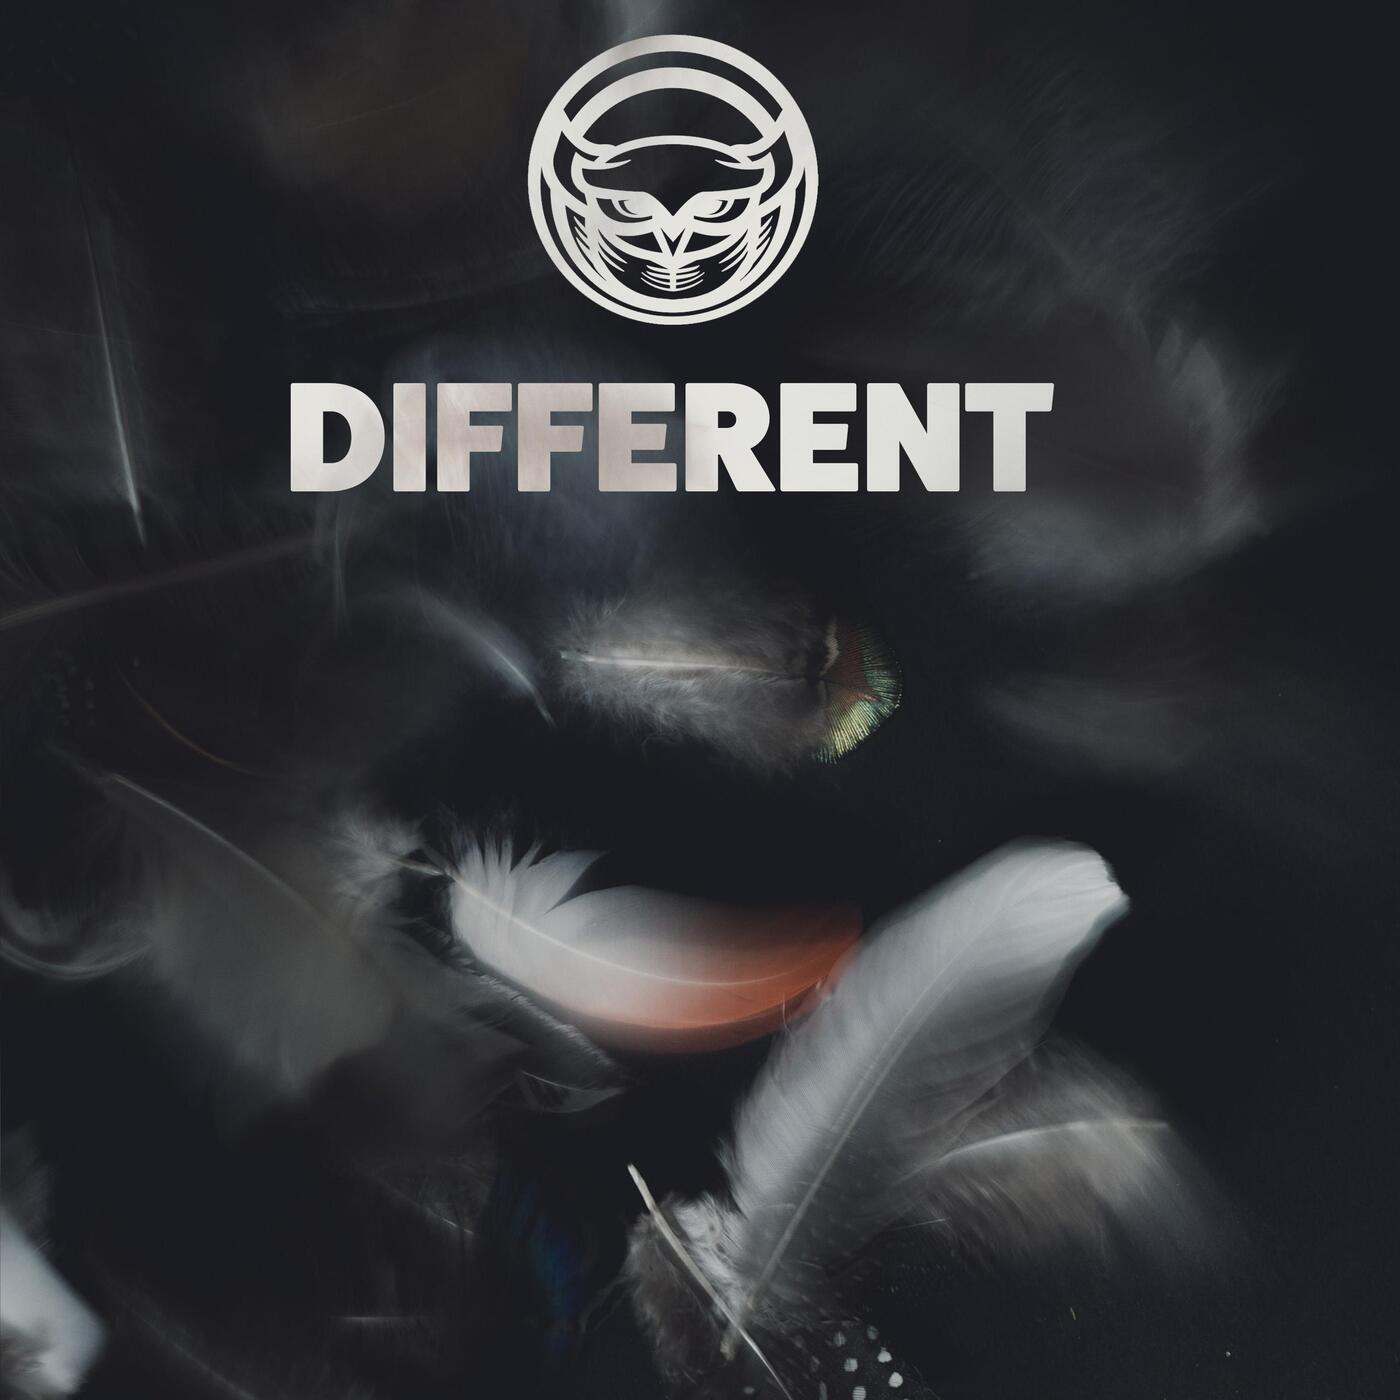 Different (Original Mix)